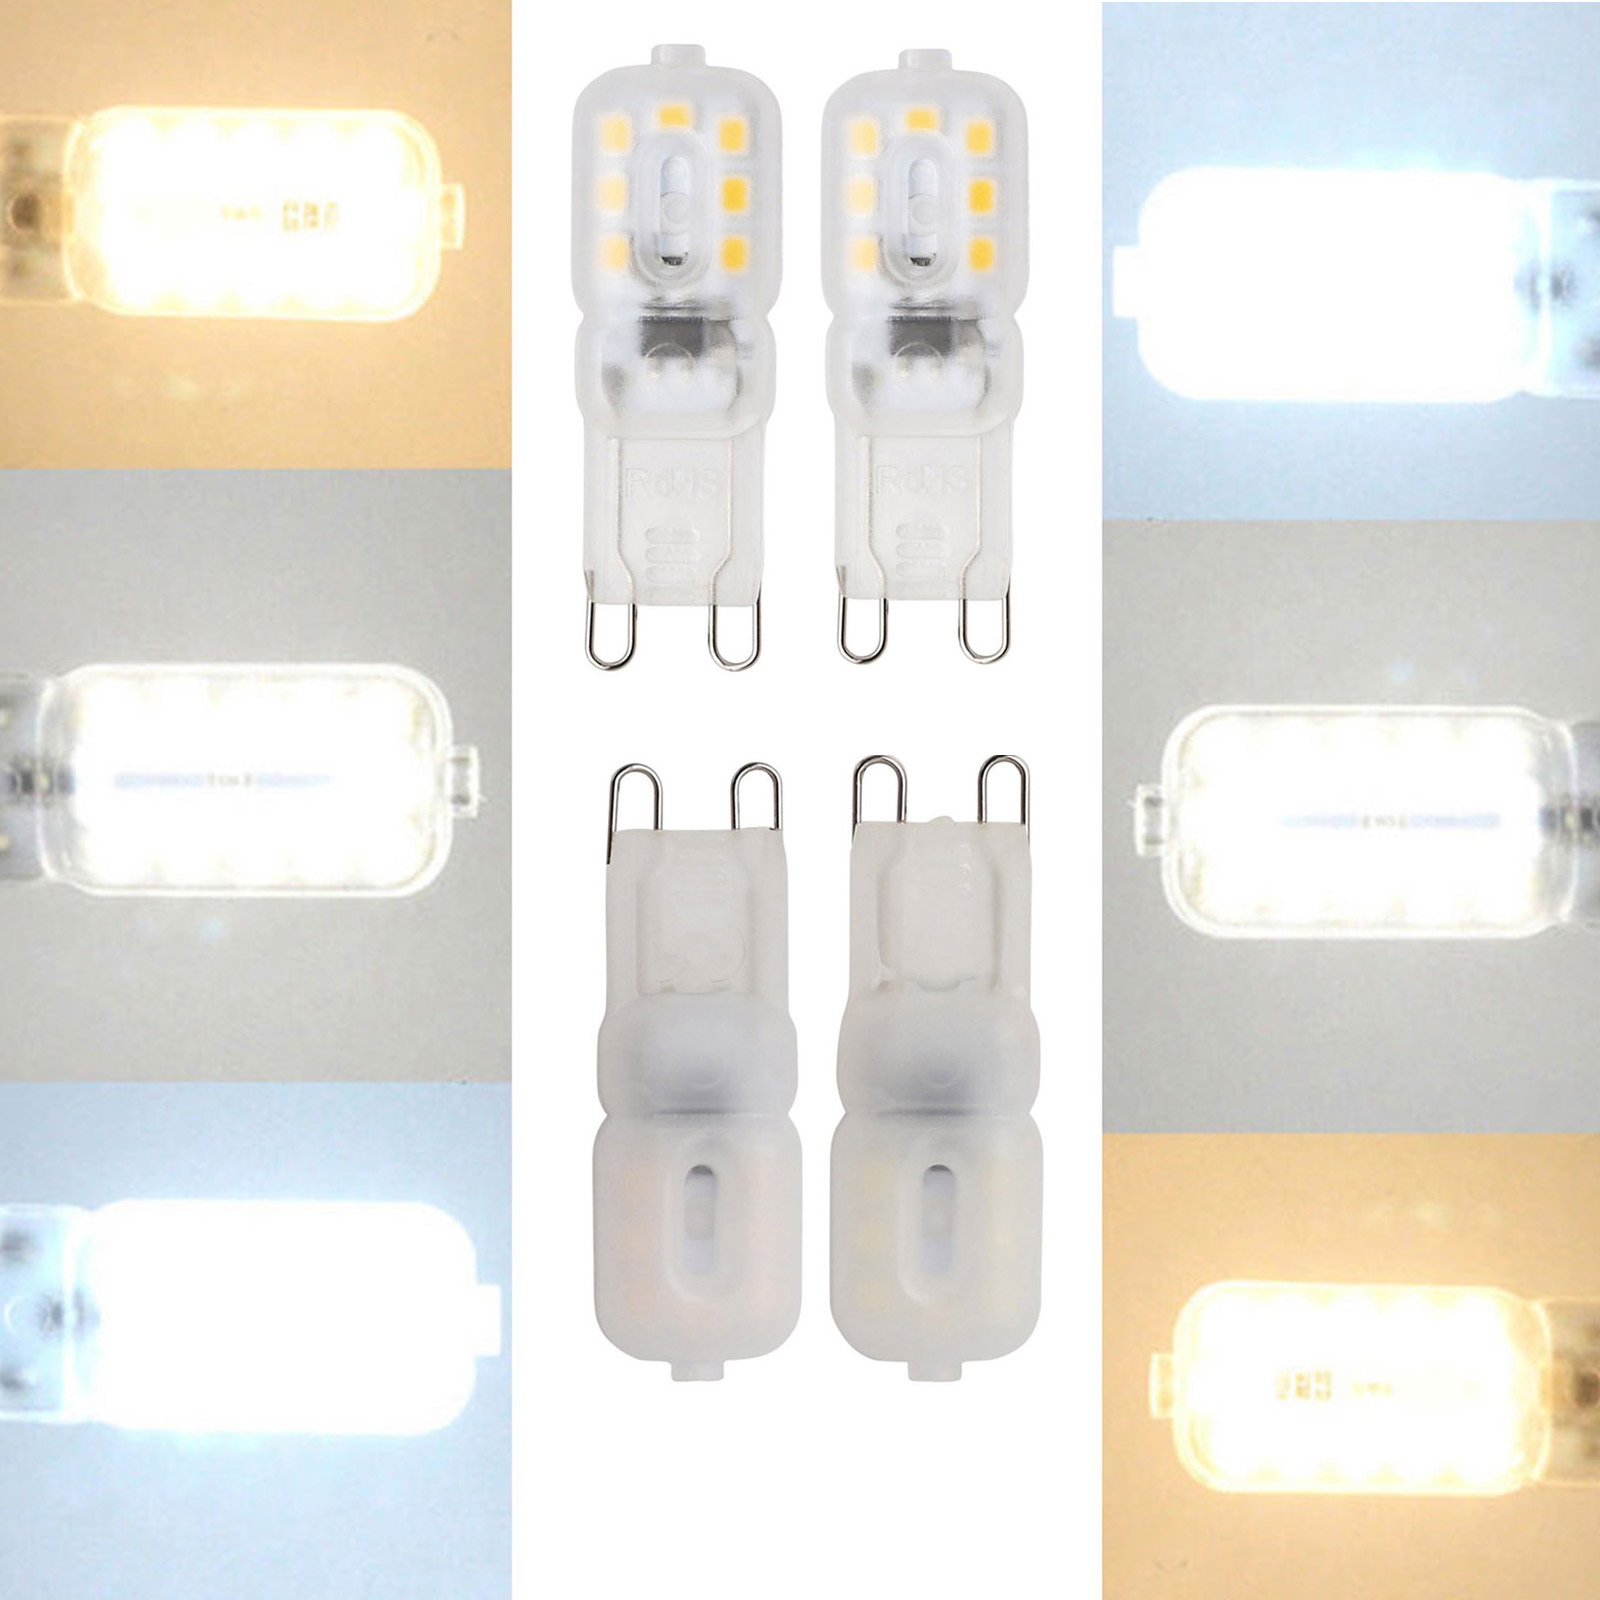 Mini 3W 14LEDs G9 LED Lamp  LED Bulb SMD2835 Spotlight Chandelier High Quality Lighting Replace 30W Halogen Lamps 110V 220V